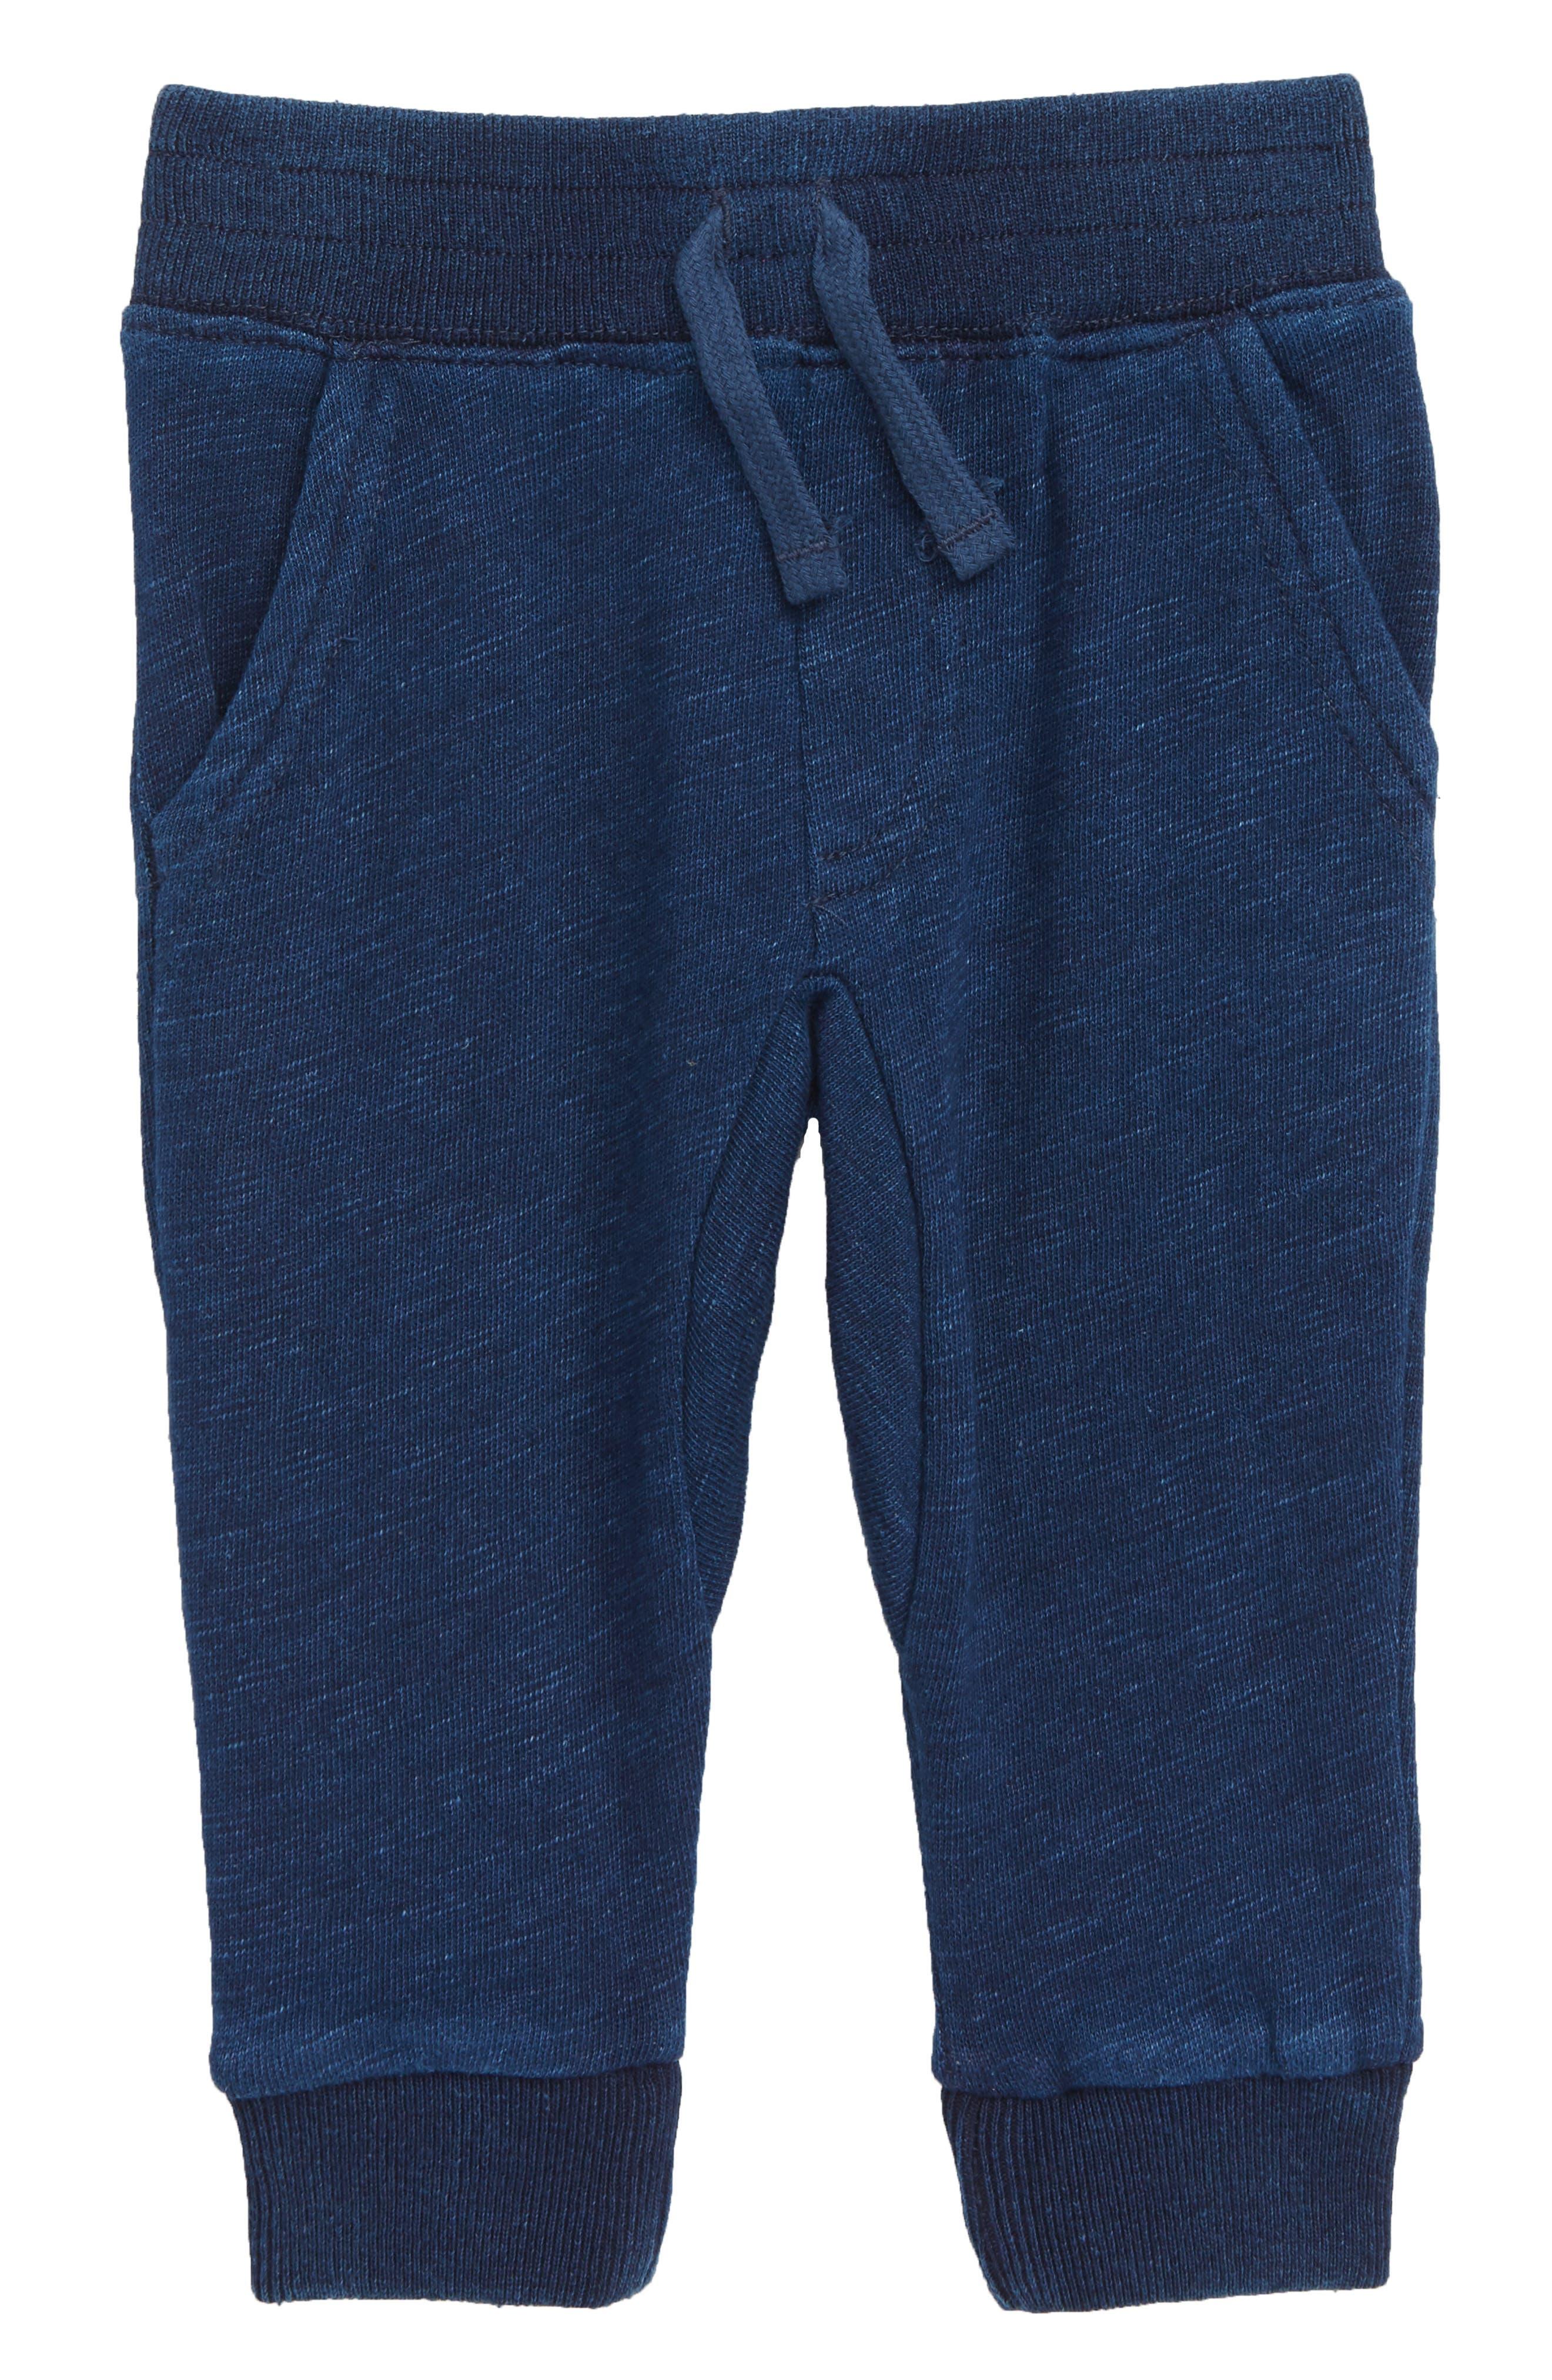 Indigo French Terry Jogger Pants,                         Main,                         color, DARK STONE INDIGO